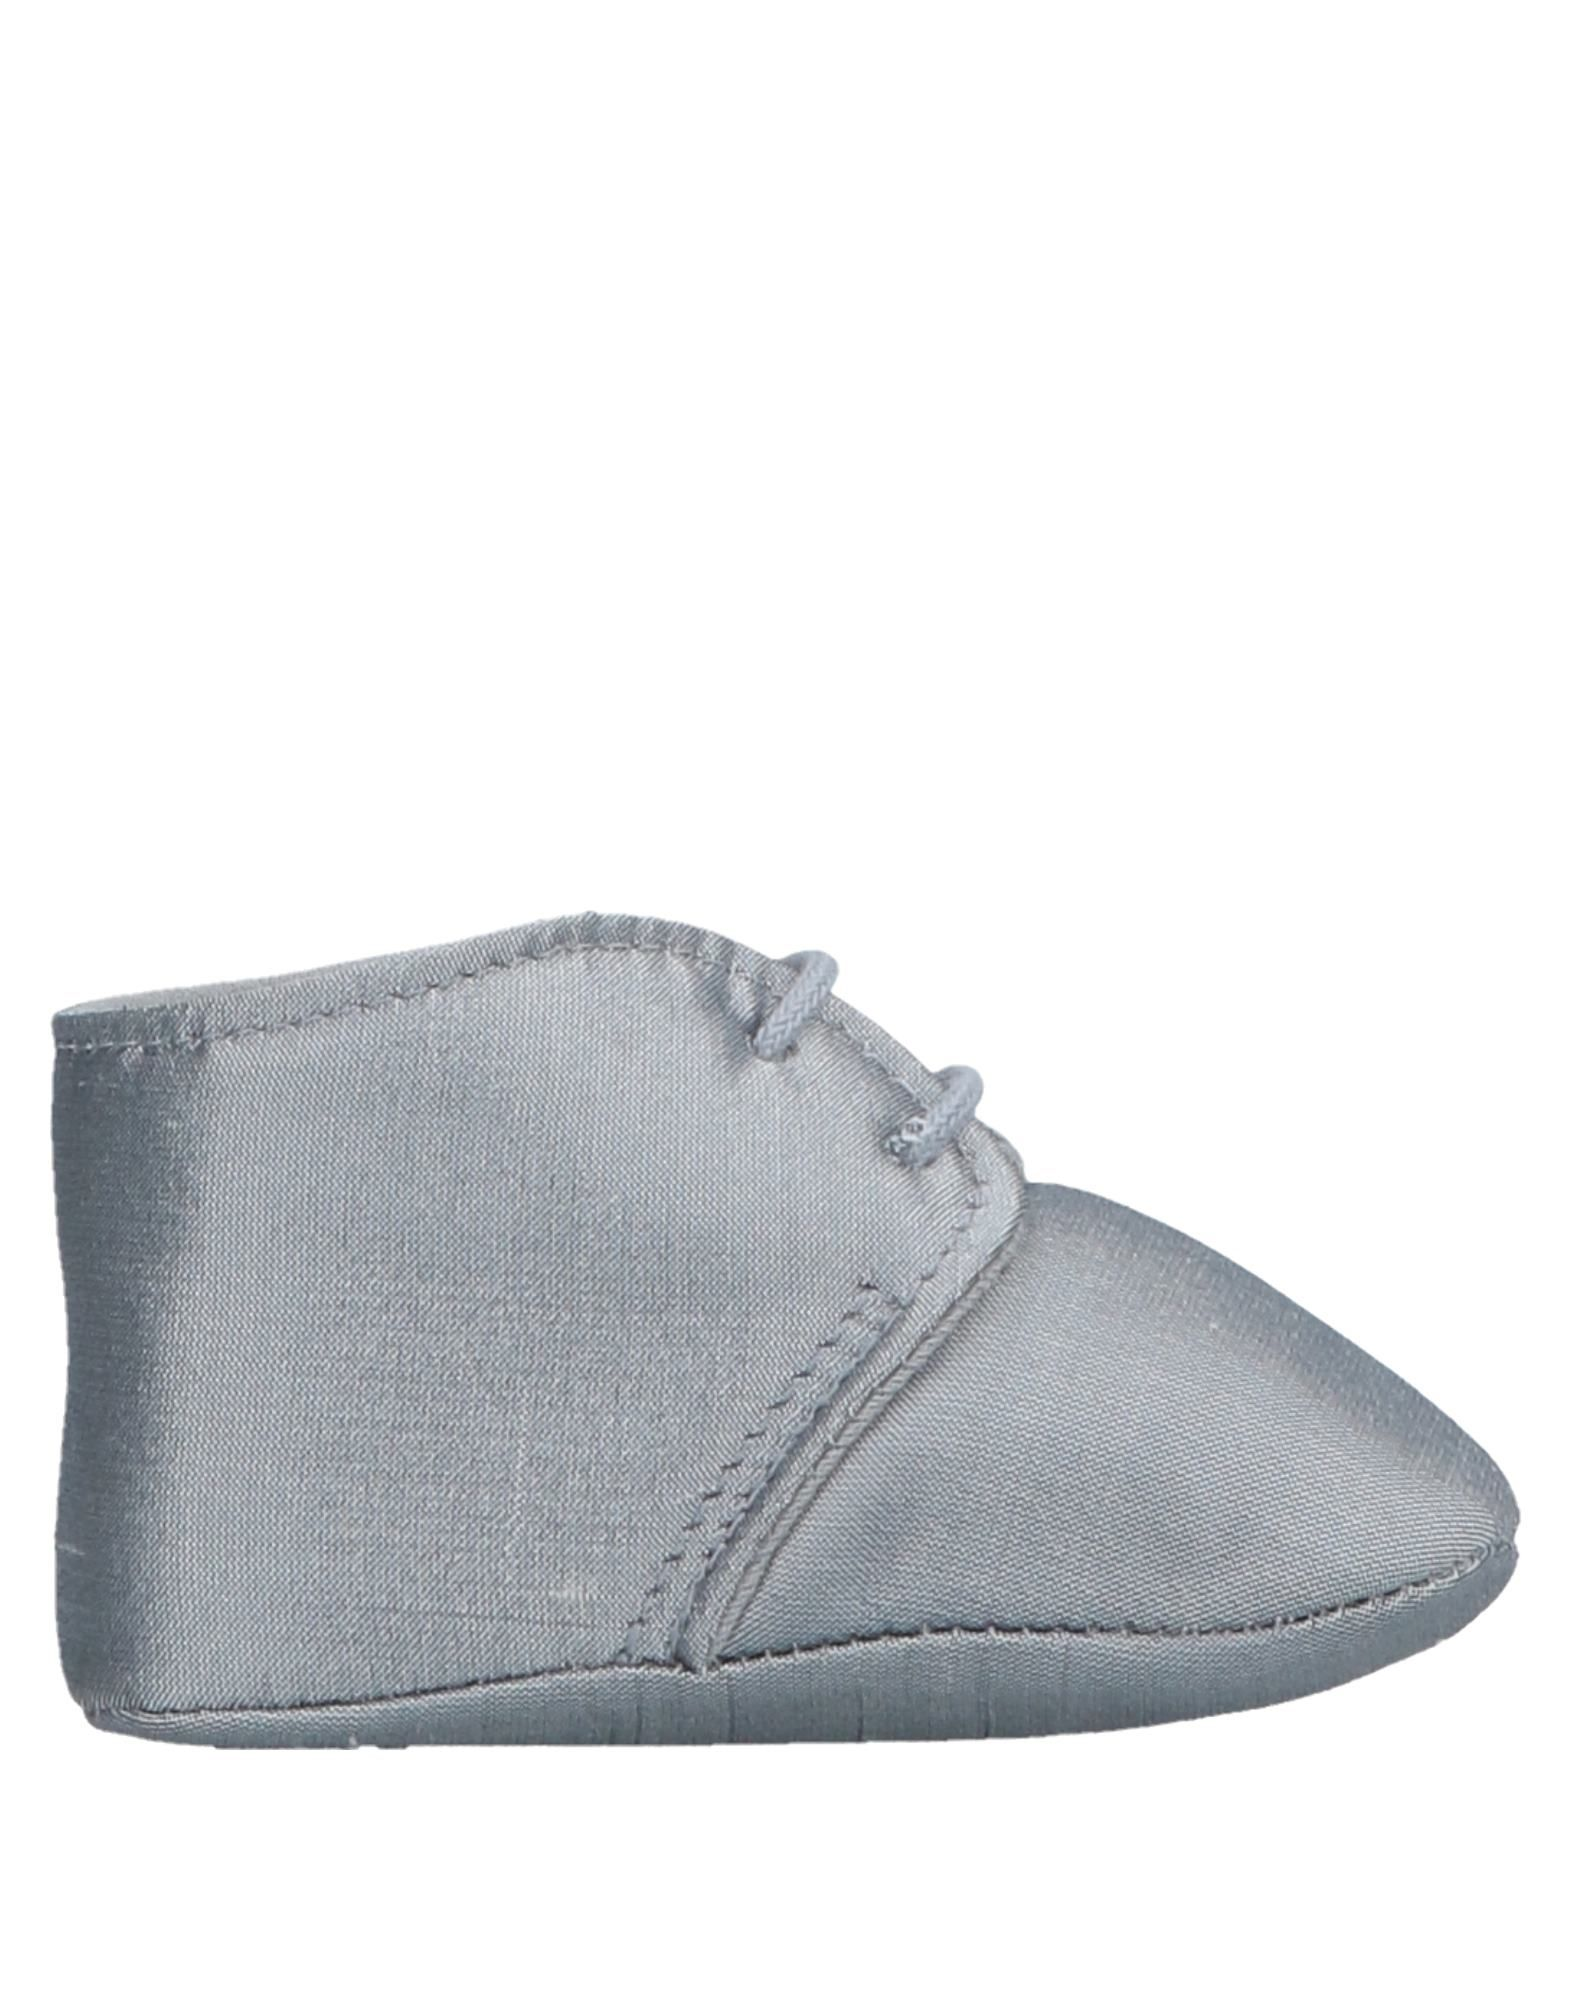 IL GUFO Обувь для новорожденных